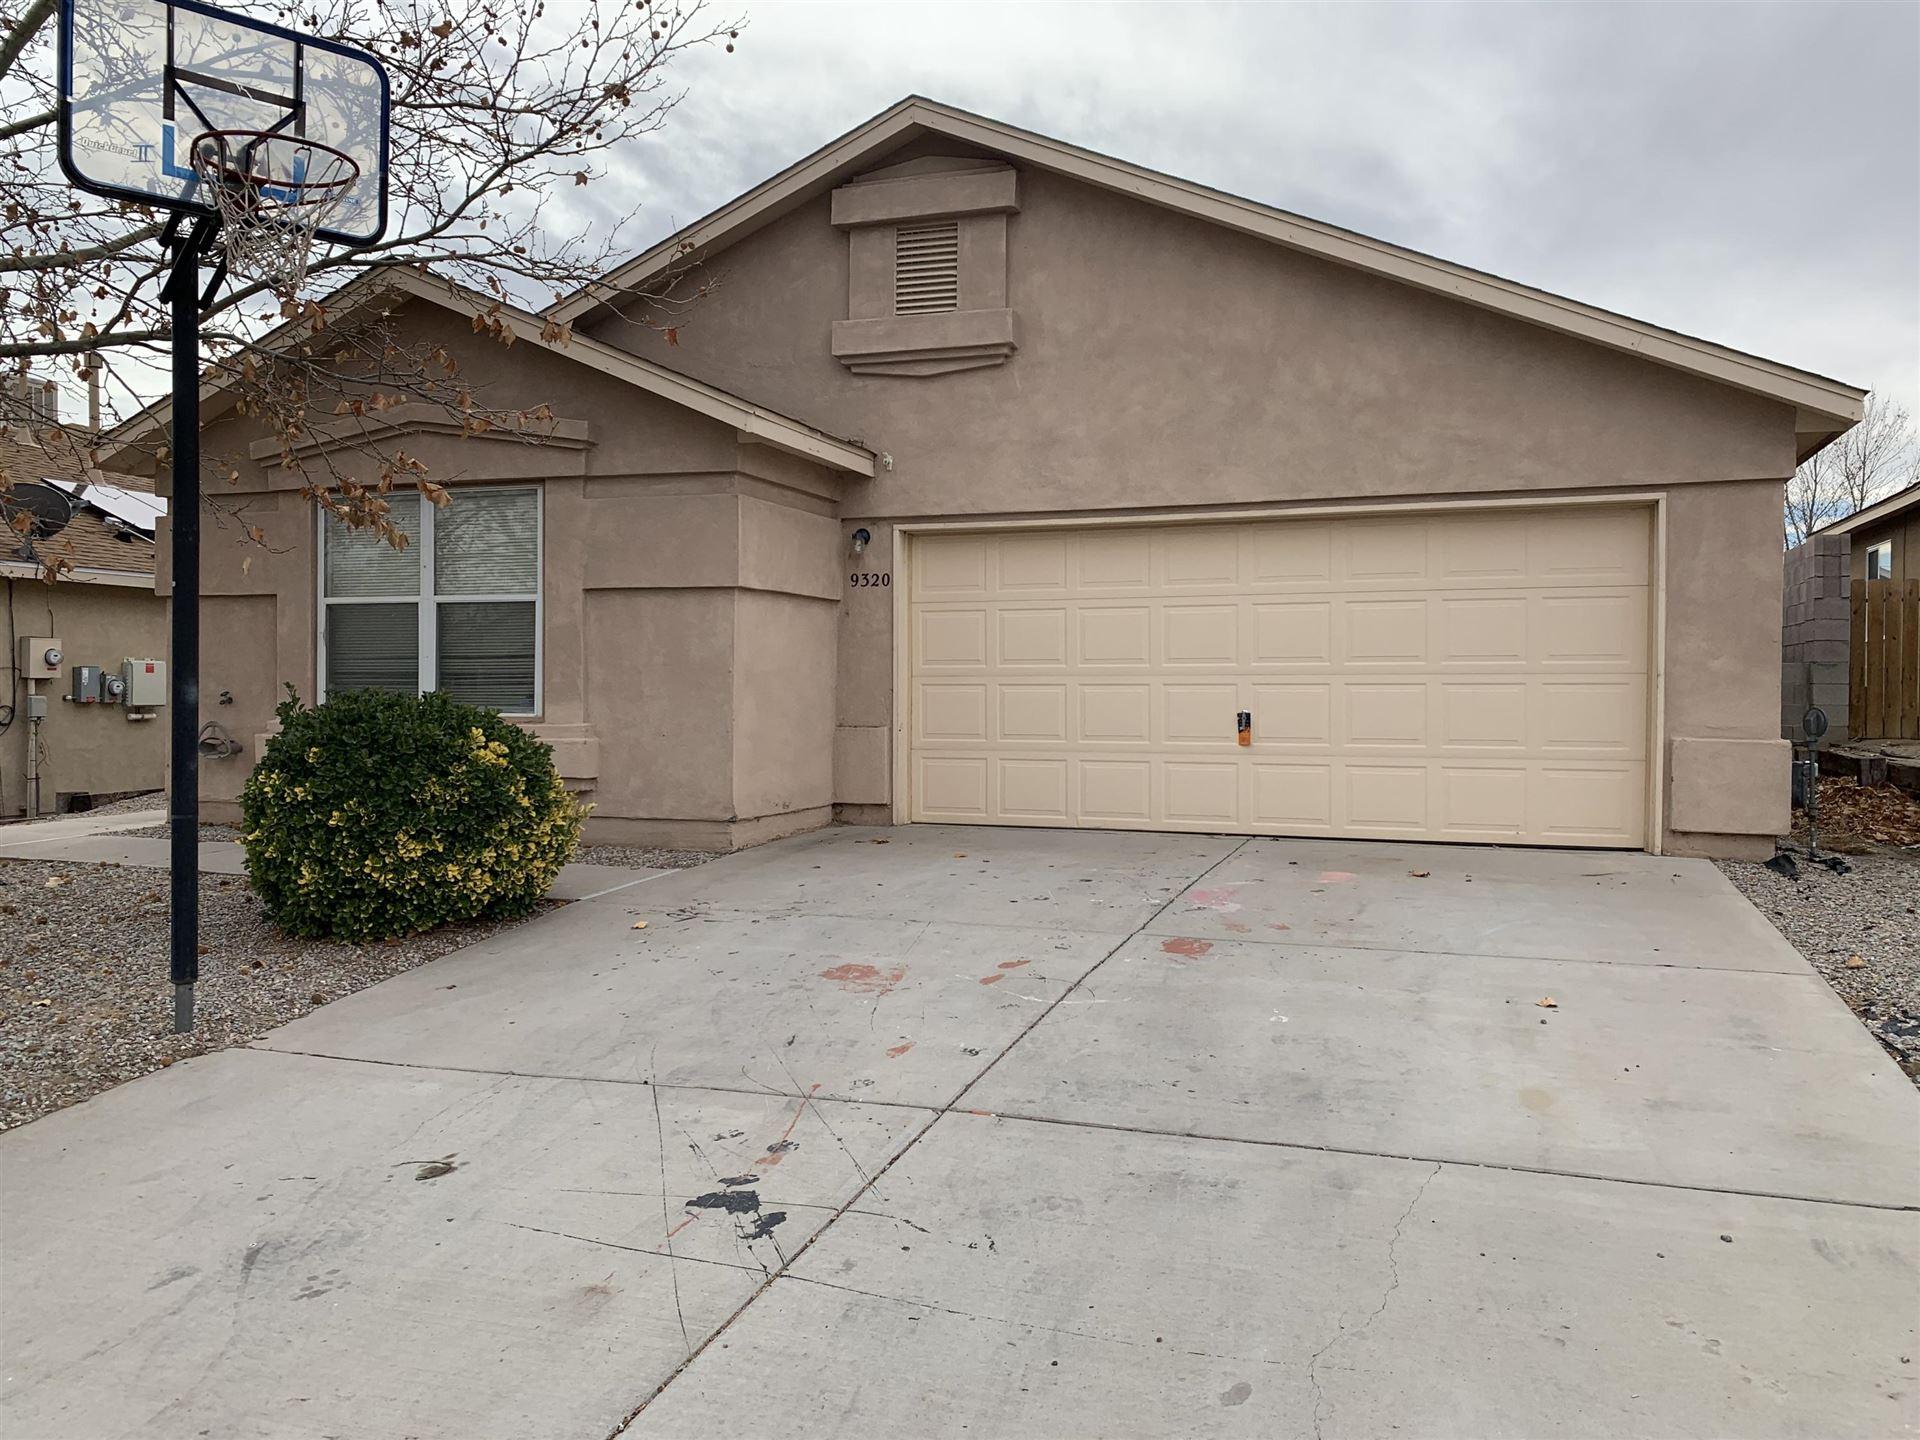 9320 STARBOARD Road NW, Albuquerque, NM 87121 - MLS#: 984770